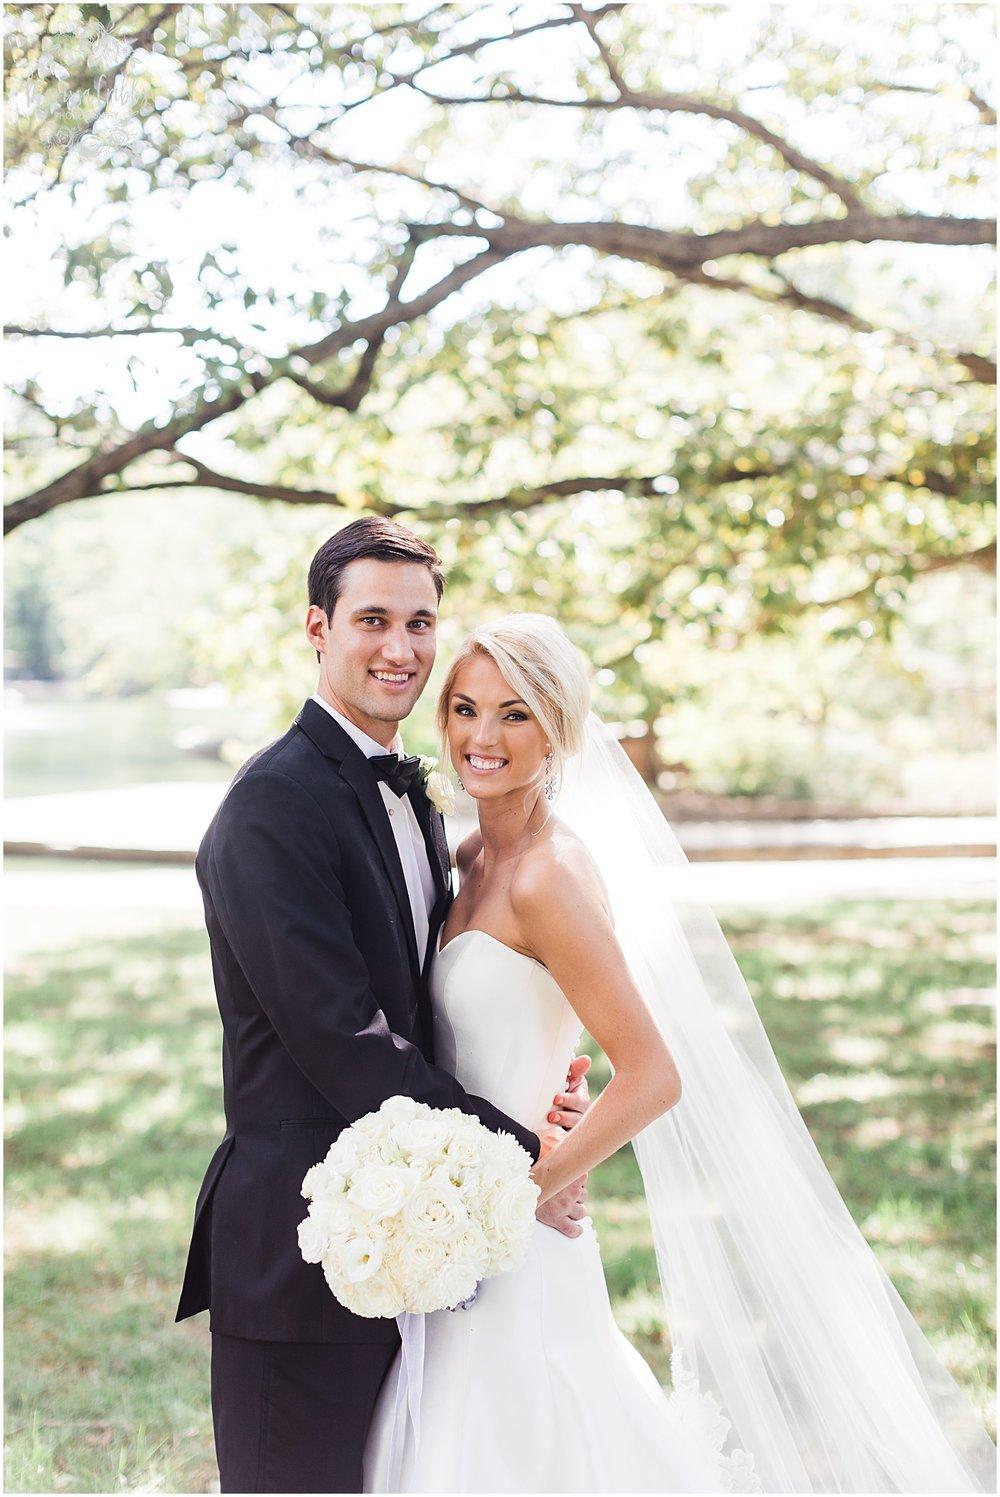 NOLL WEDDING | THE BRASS ON BALTIMORE | MARISSA CRIBBS PHOTOGRAPHY_6307.jpg